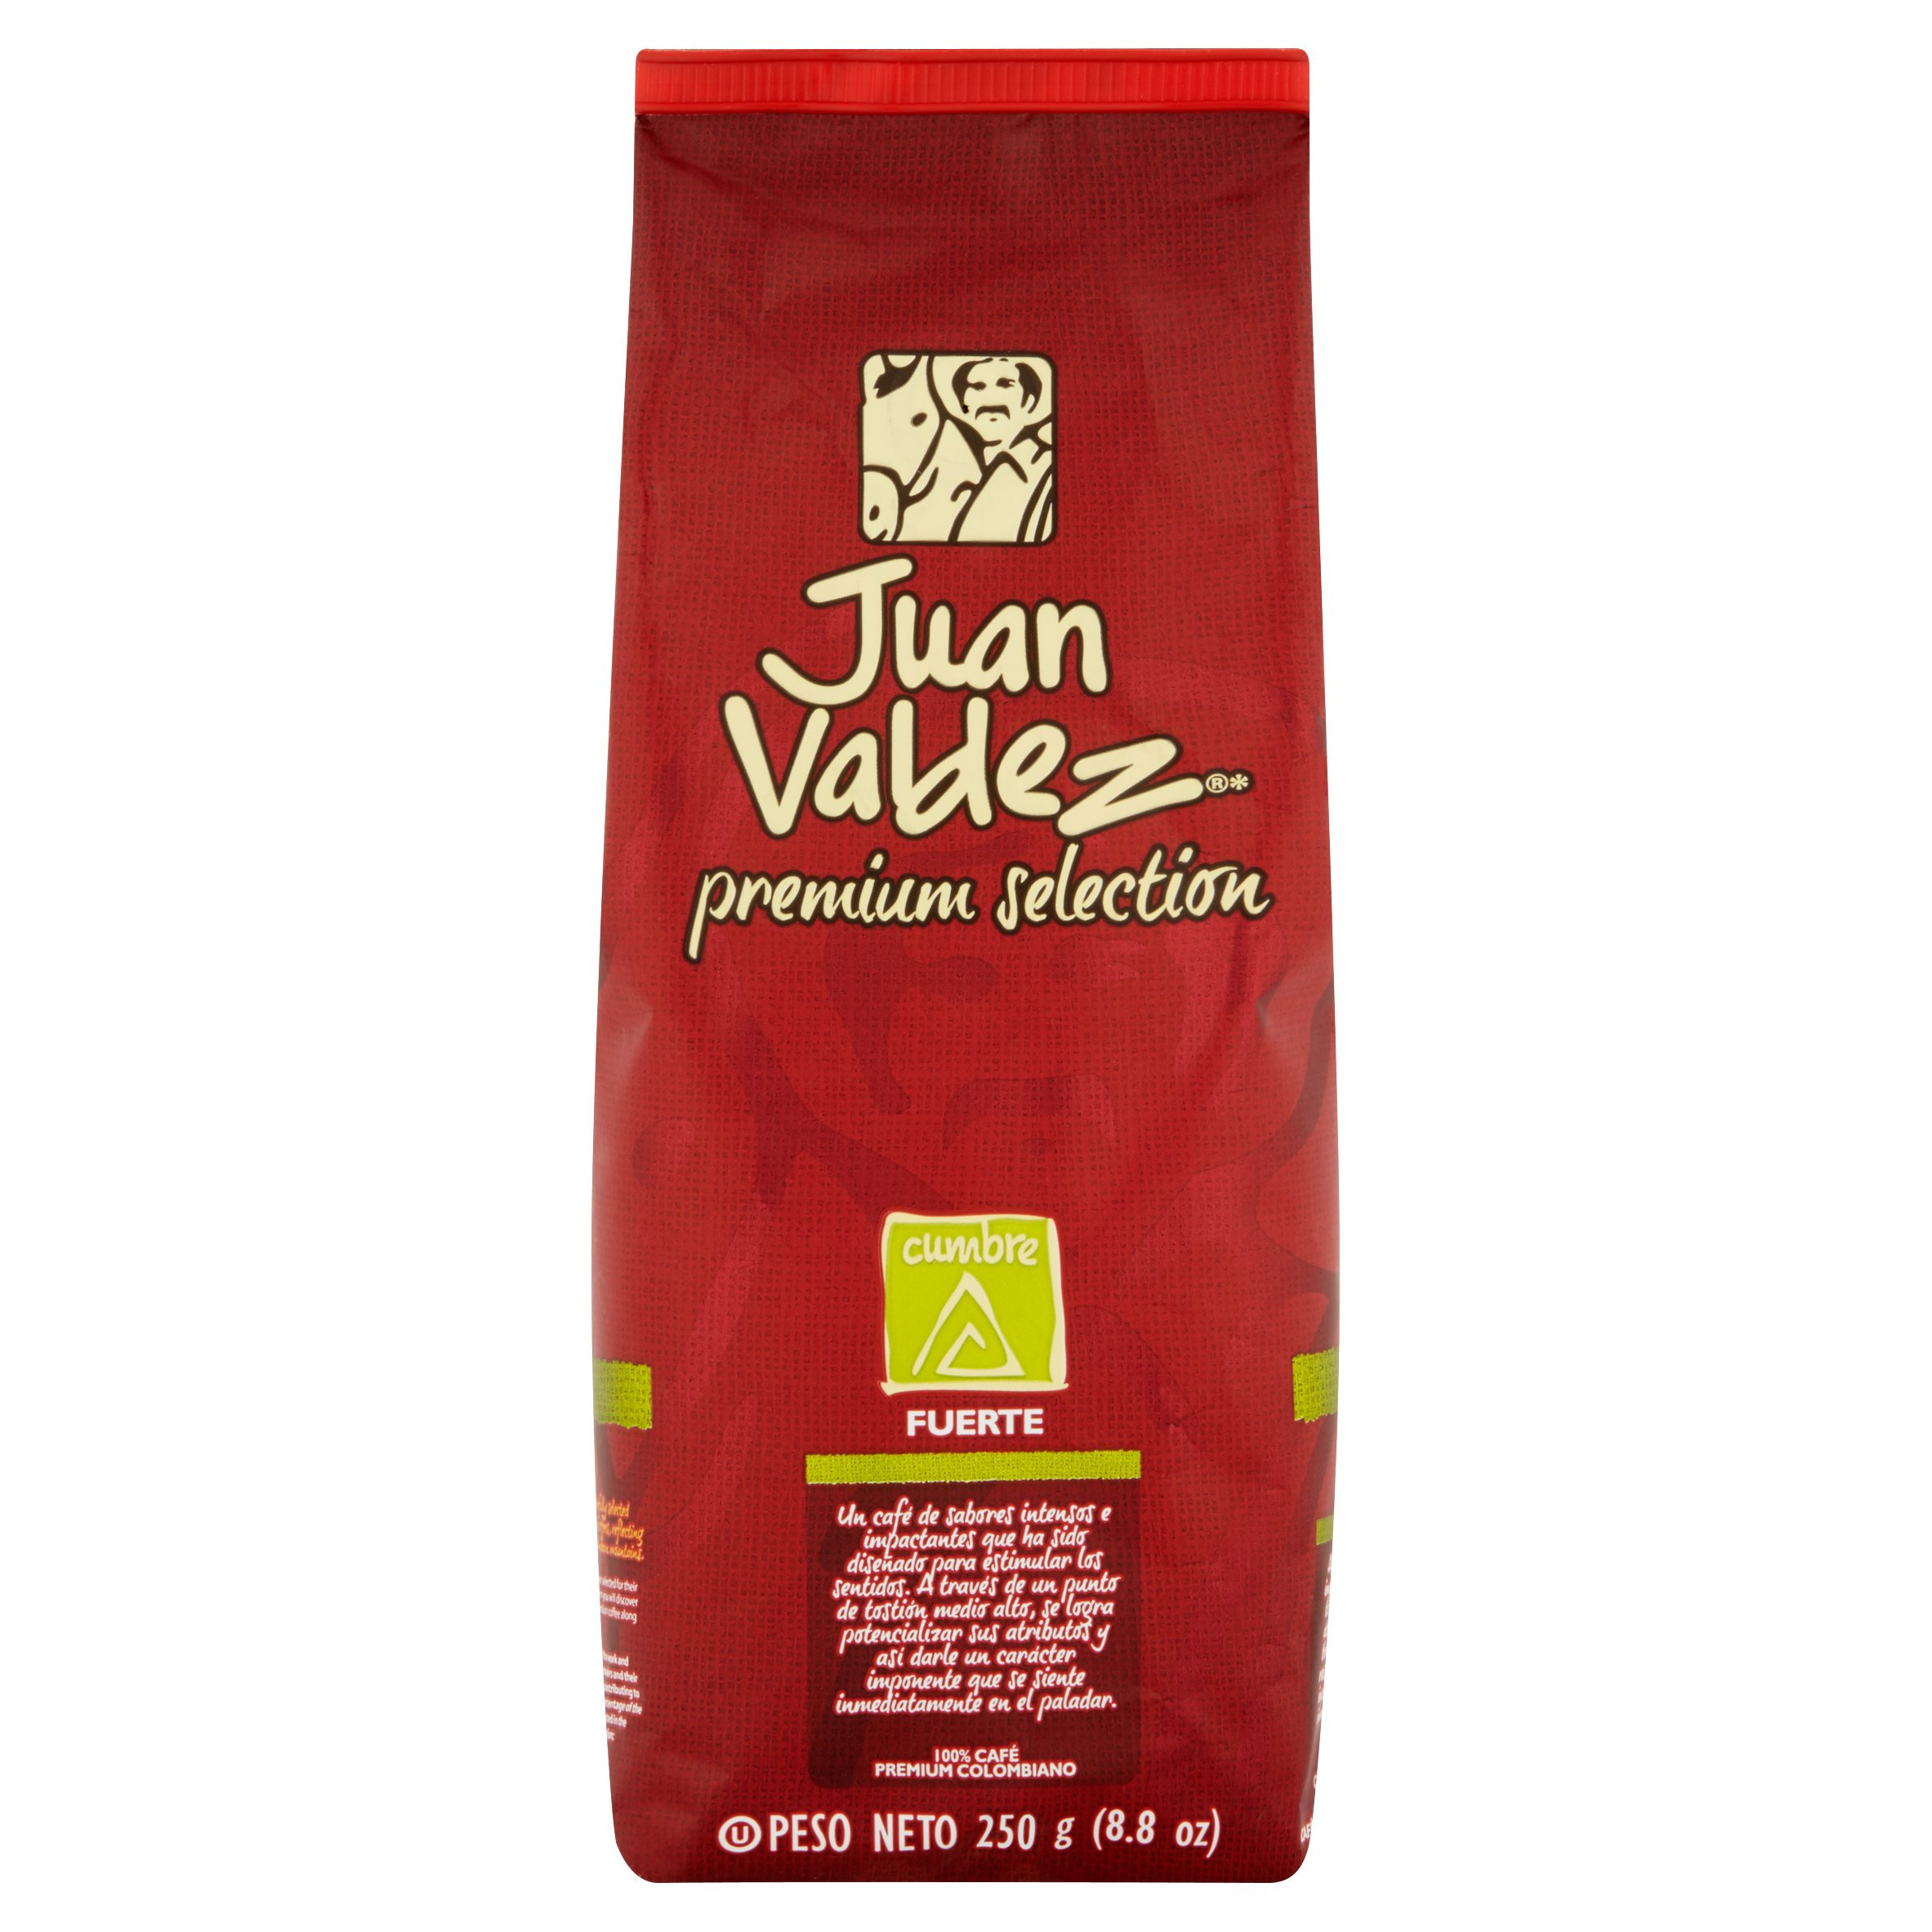 Juan Valdez Premium Selection Cumbre Roasted Coffee, 8.8 oz